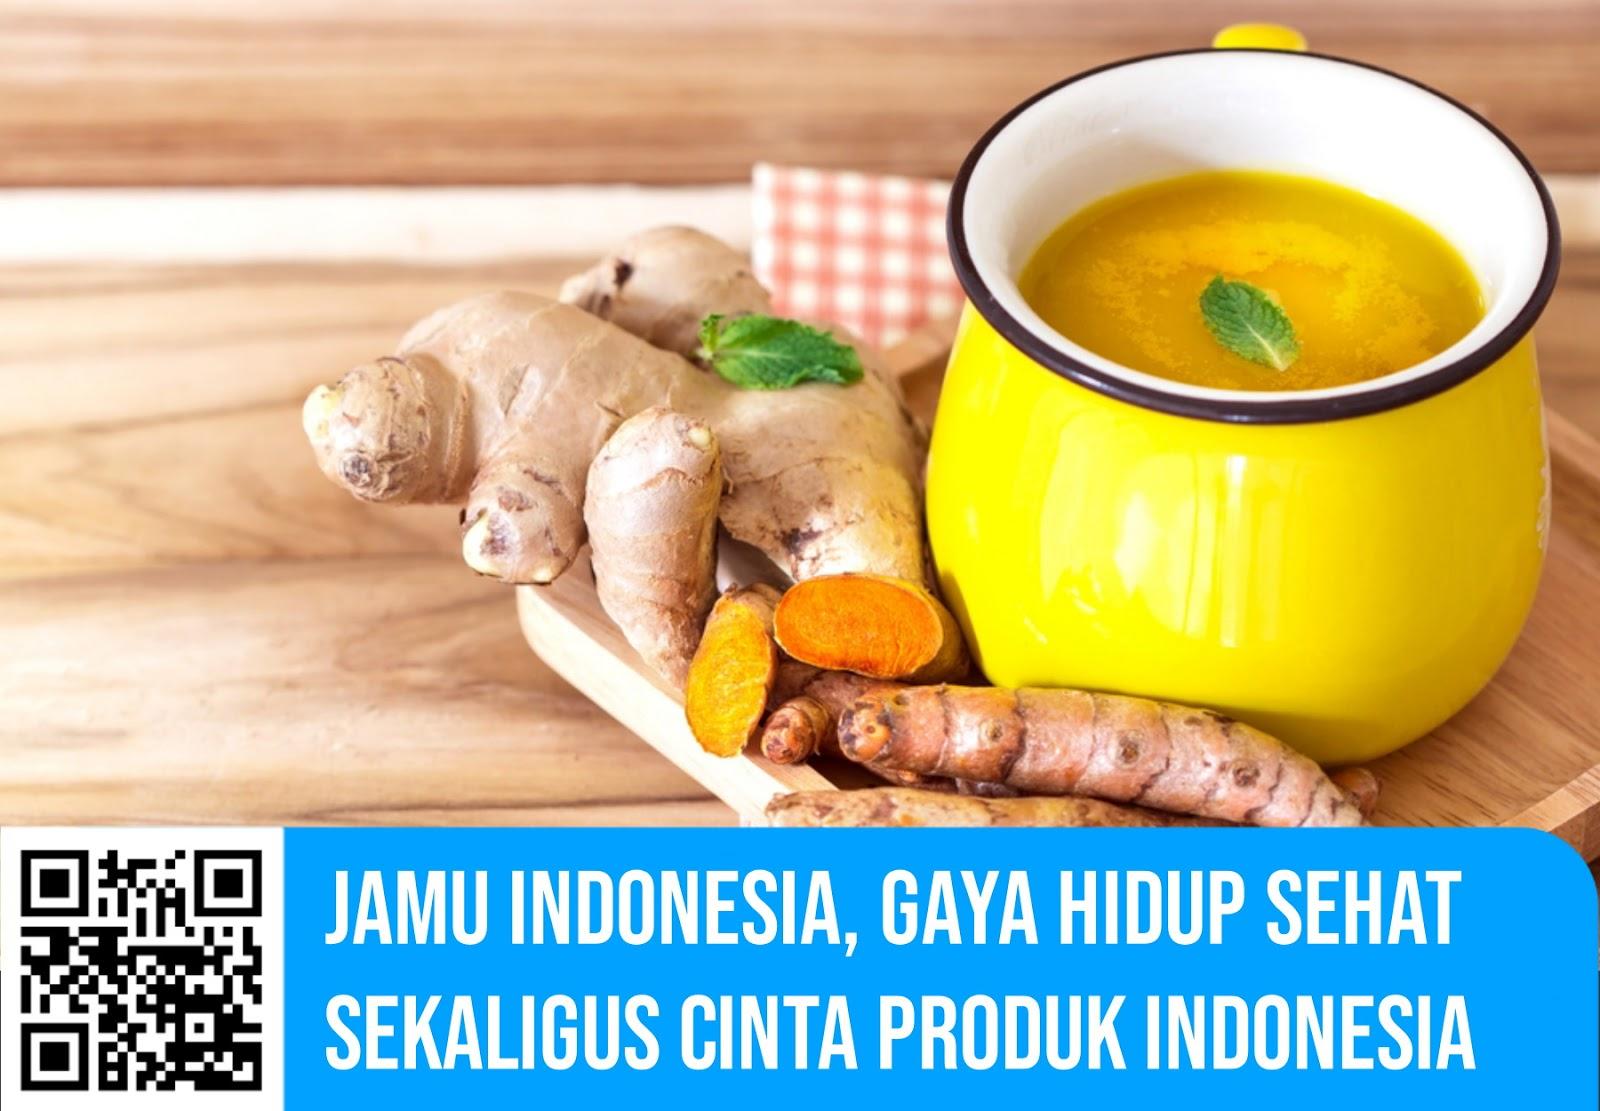 Jamu-Indonesia-Gaya-Hidup-Sehat-Sekaligus-Cinta-Produk-Indonesia